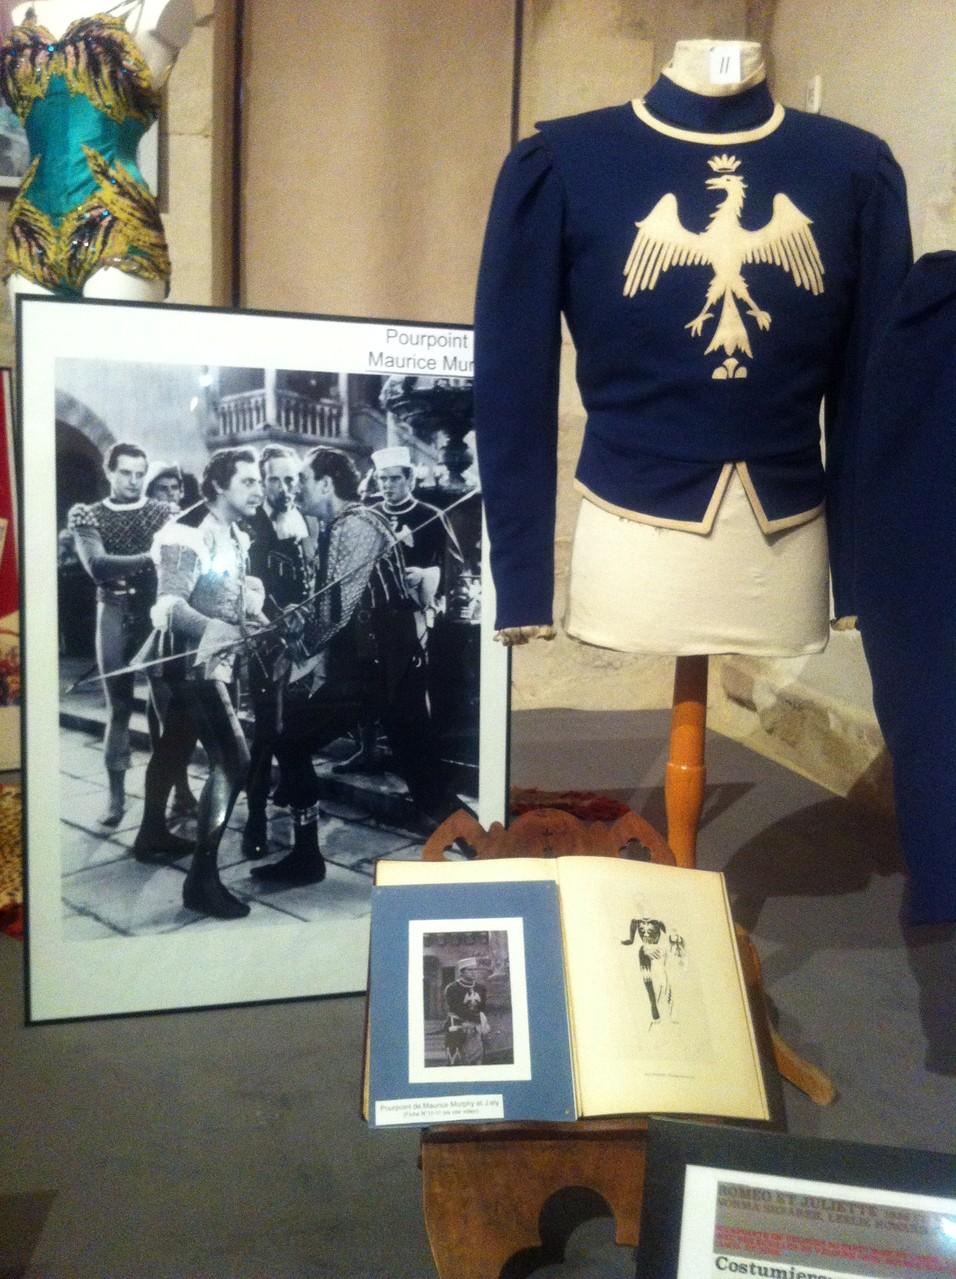 Costume porté par MAURICE MURPHY (Balthazar) dans ROMEO AND JULIET 1936